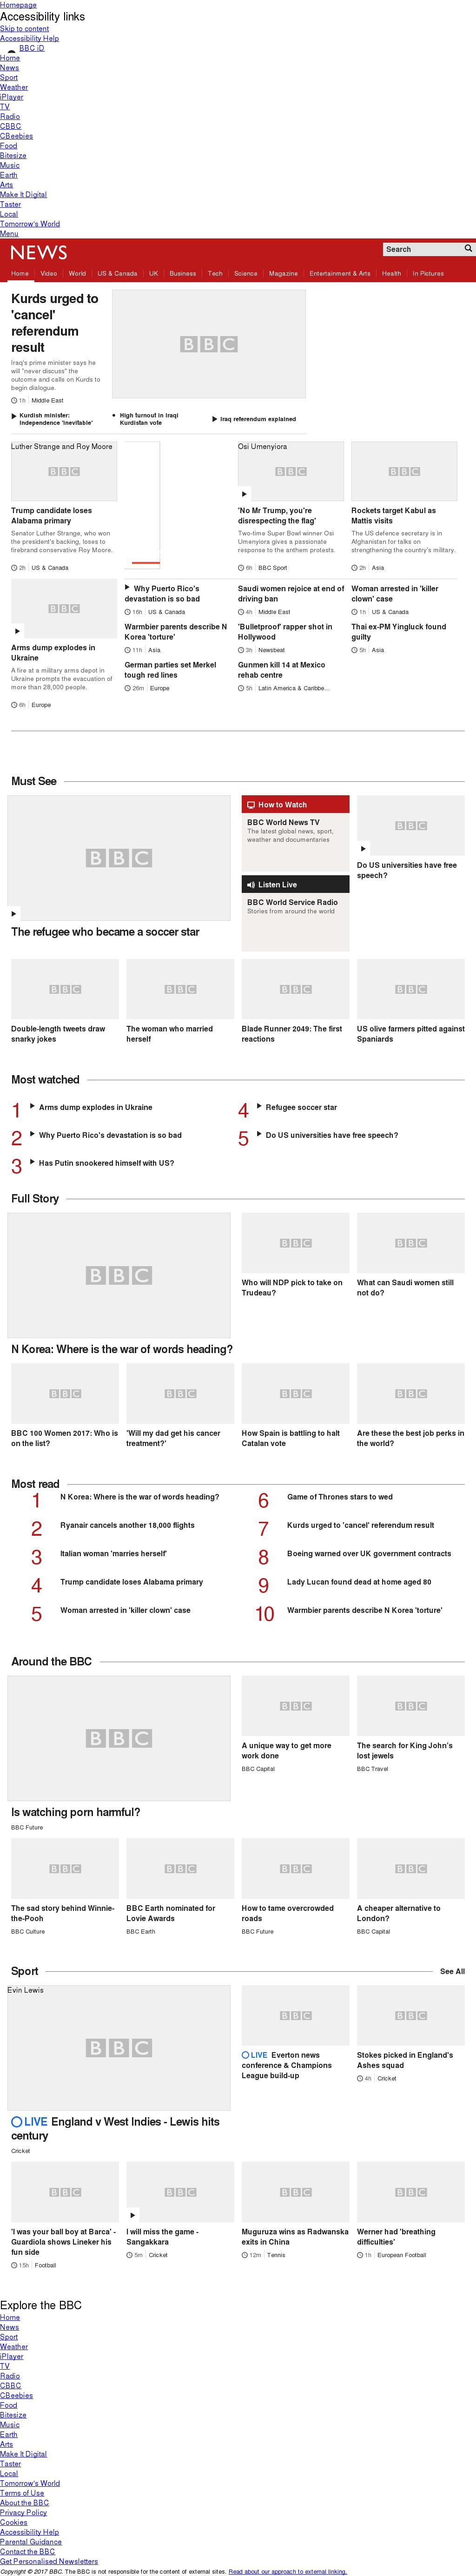 BBC at Wednesday Sept. 27, 2017, 2 p.m. UTC